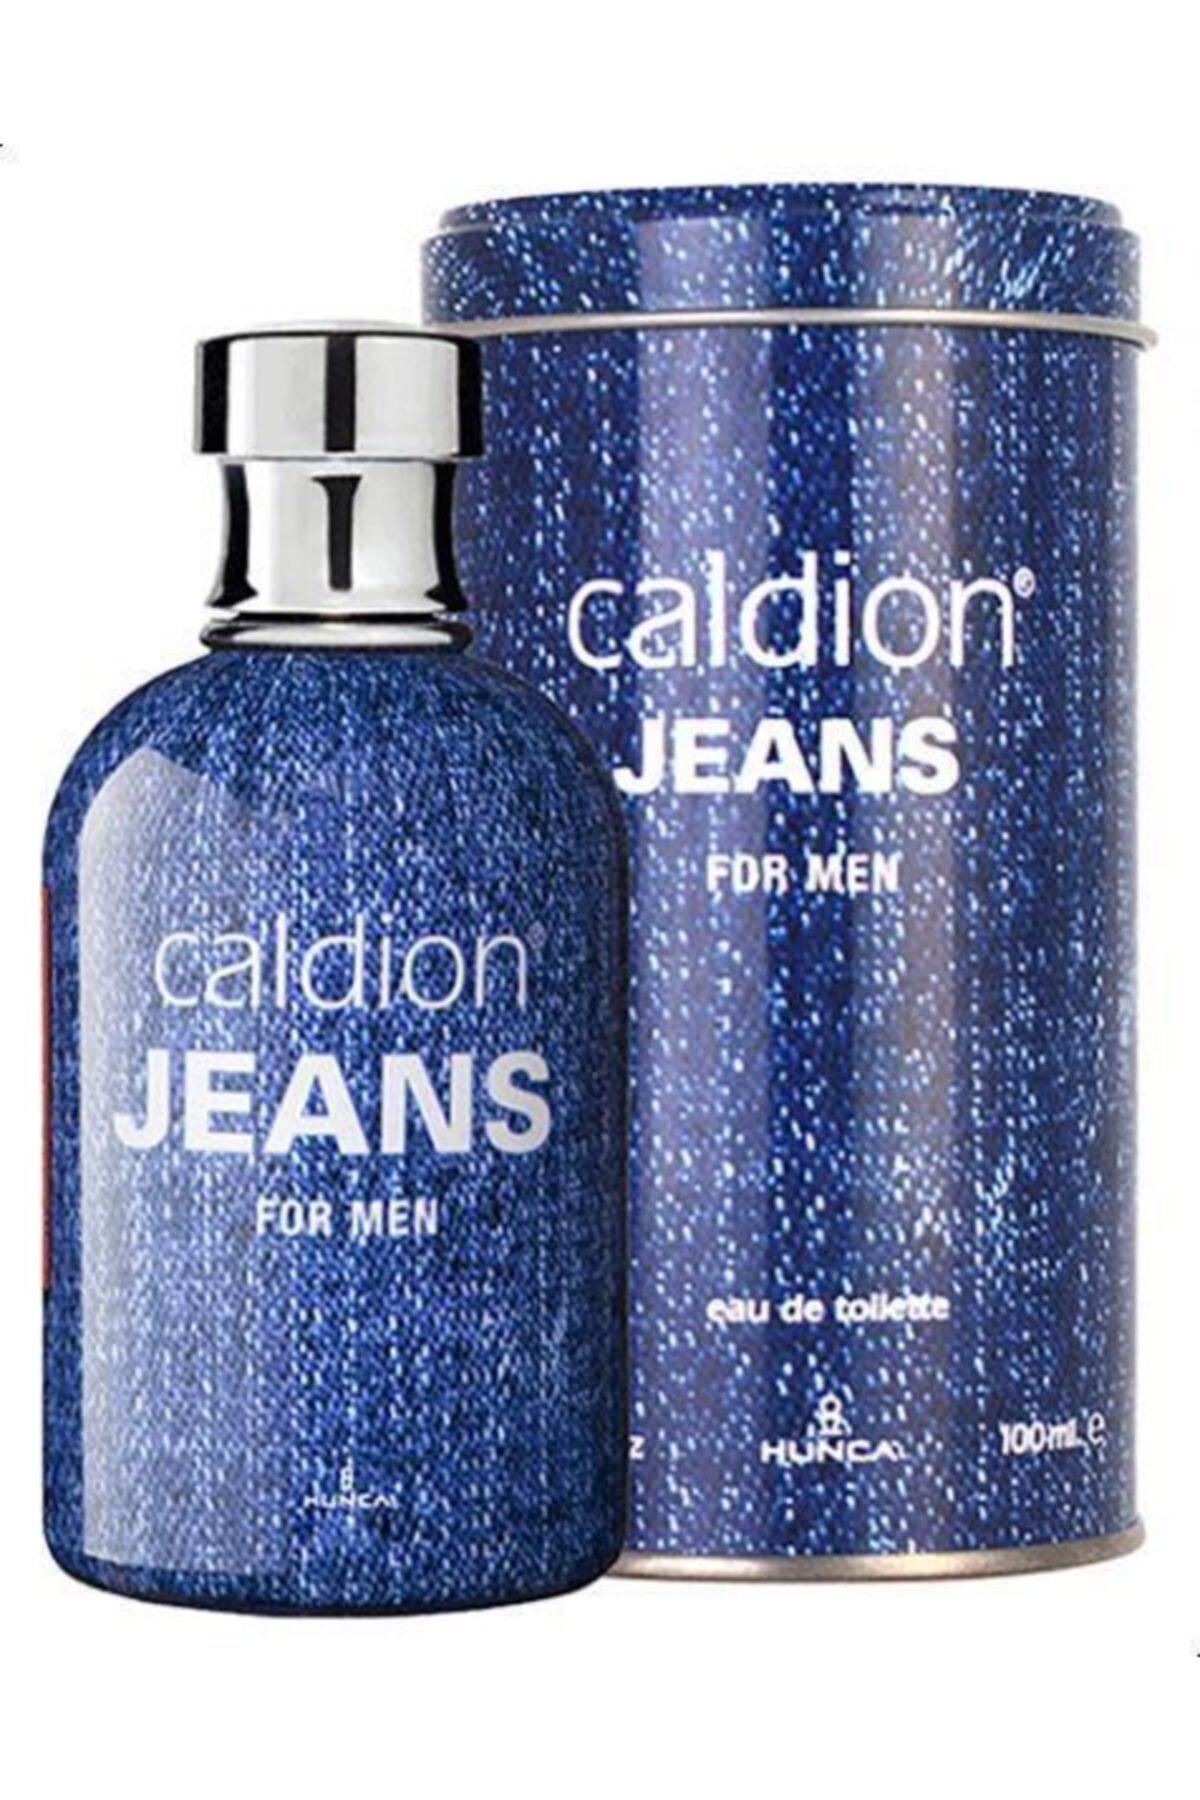 Caldion Jeans Edt 100 Ml Erkek Parfümü 1